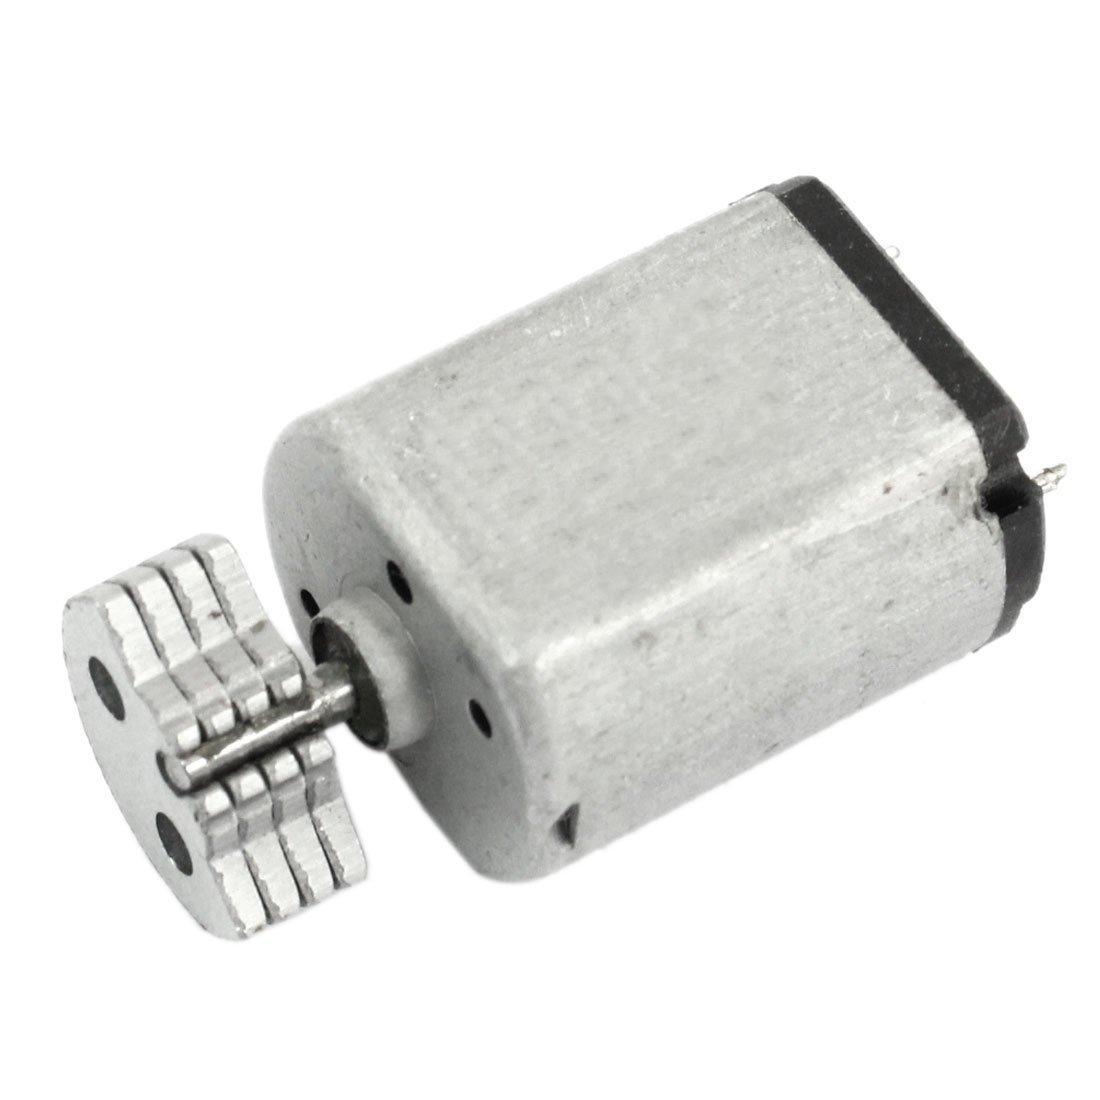 3200RPM DC Vibration Motor - TOOGOO(R) DC1.5V-9V 0.08A 3200RPM Output Speed Micro Vibrating Motor, 18x15x12mm Silver